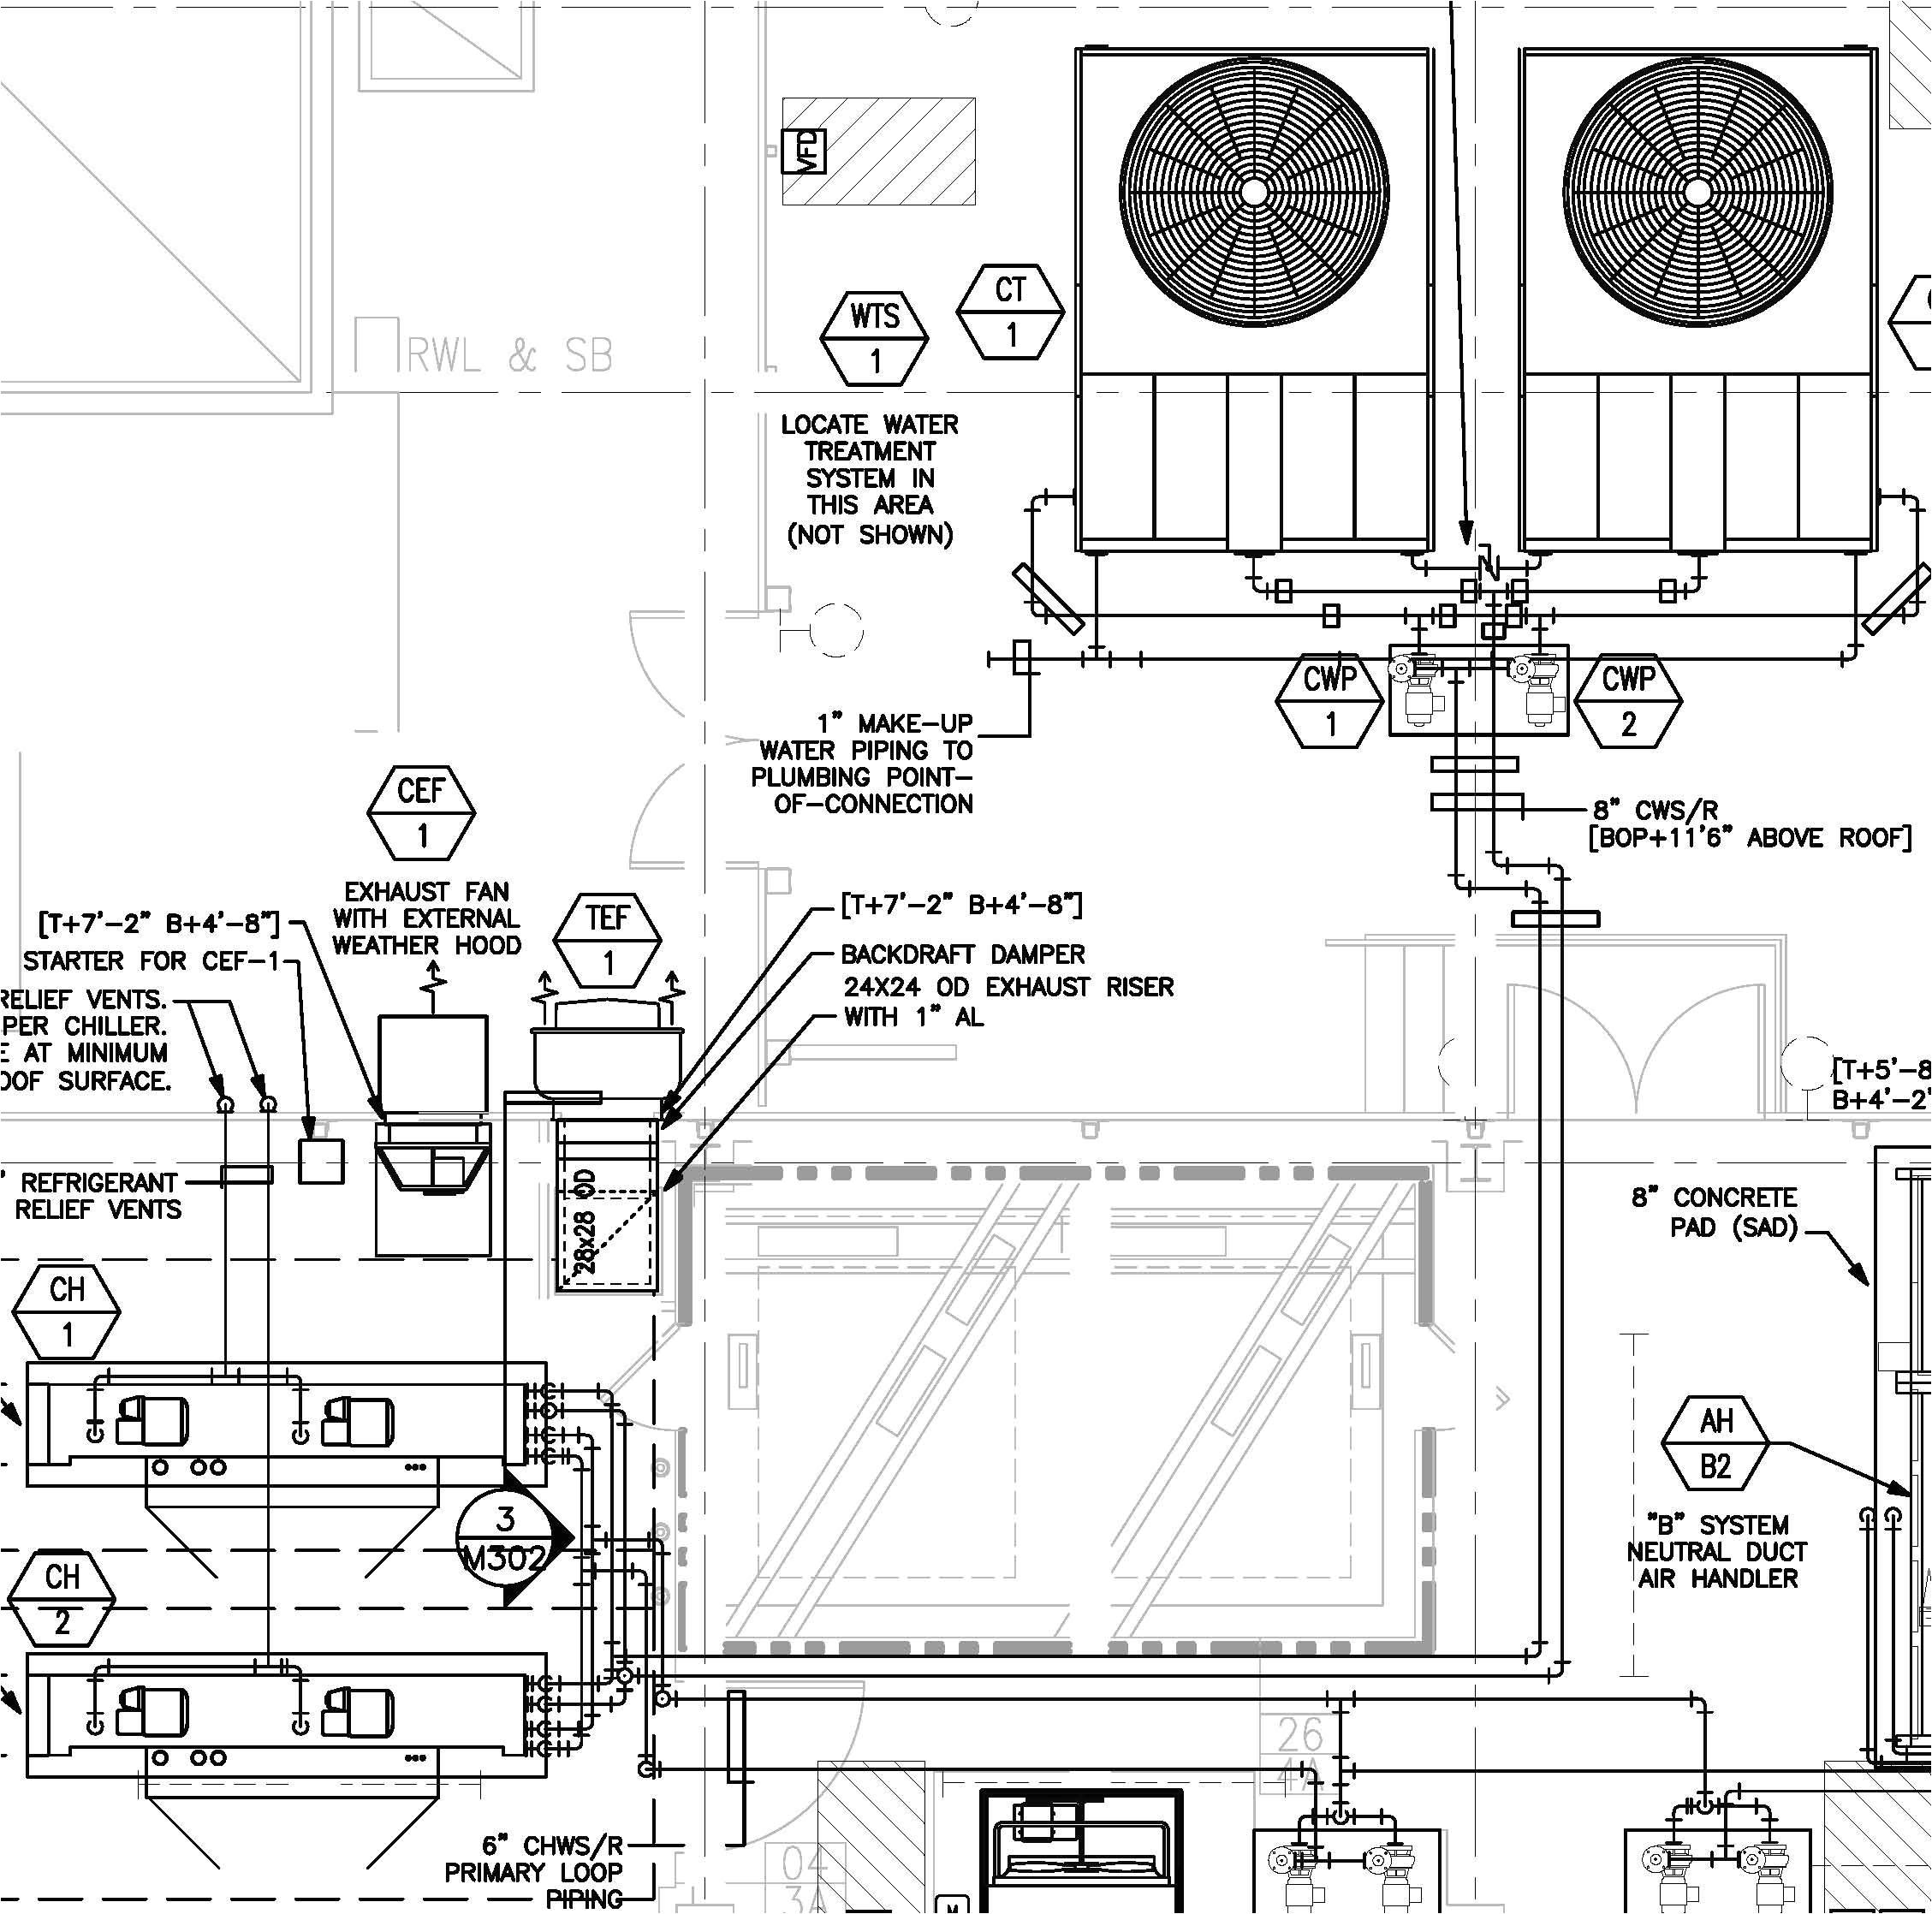 2 speed cooling fan wiring diagram elegant electric fan wiring diagram ac explained wiring diagrams